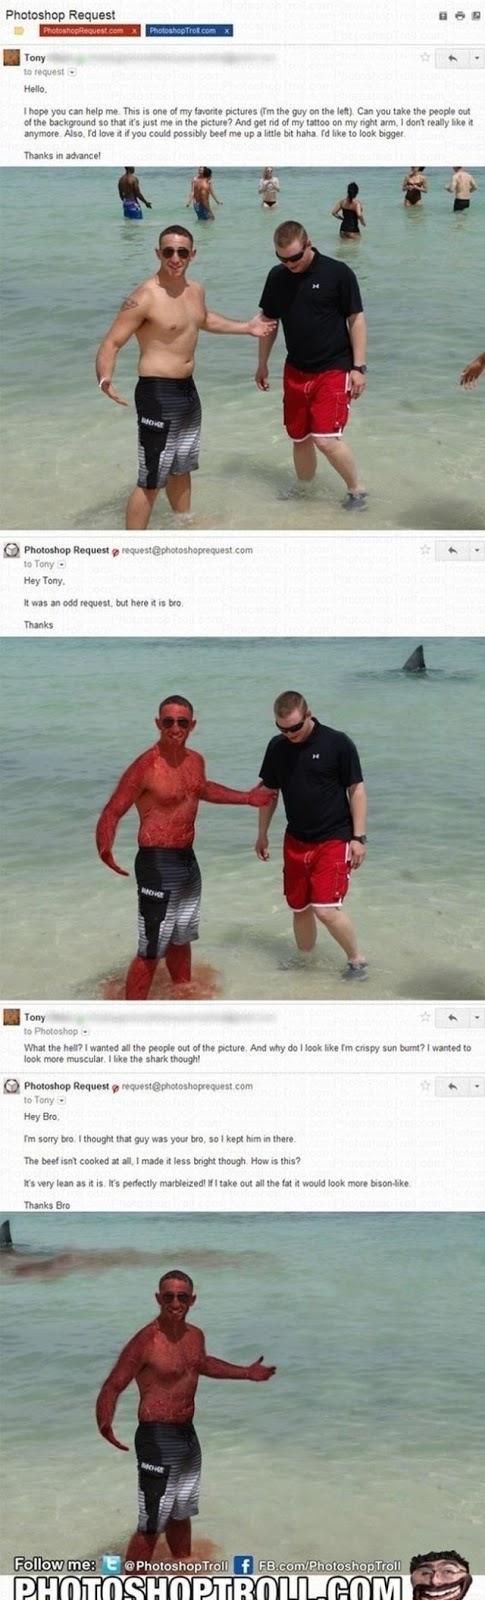 Photoshop Trolls Photos